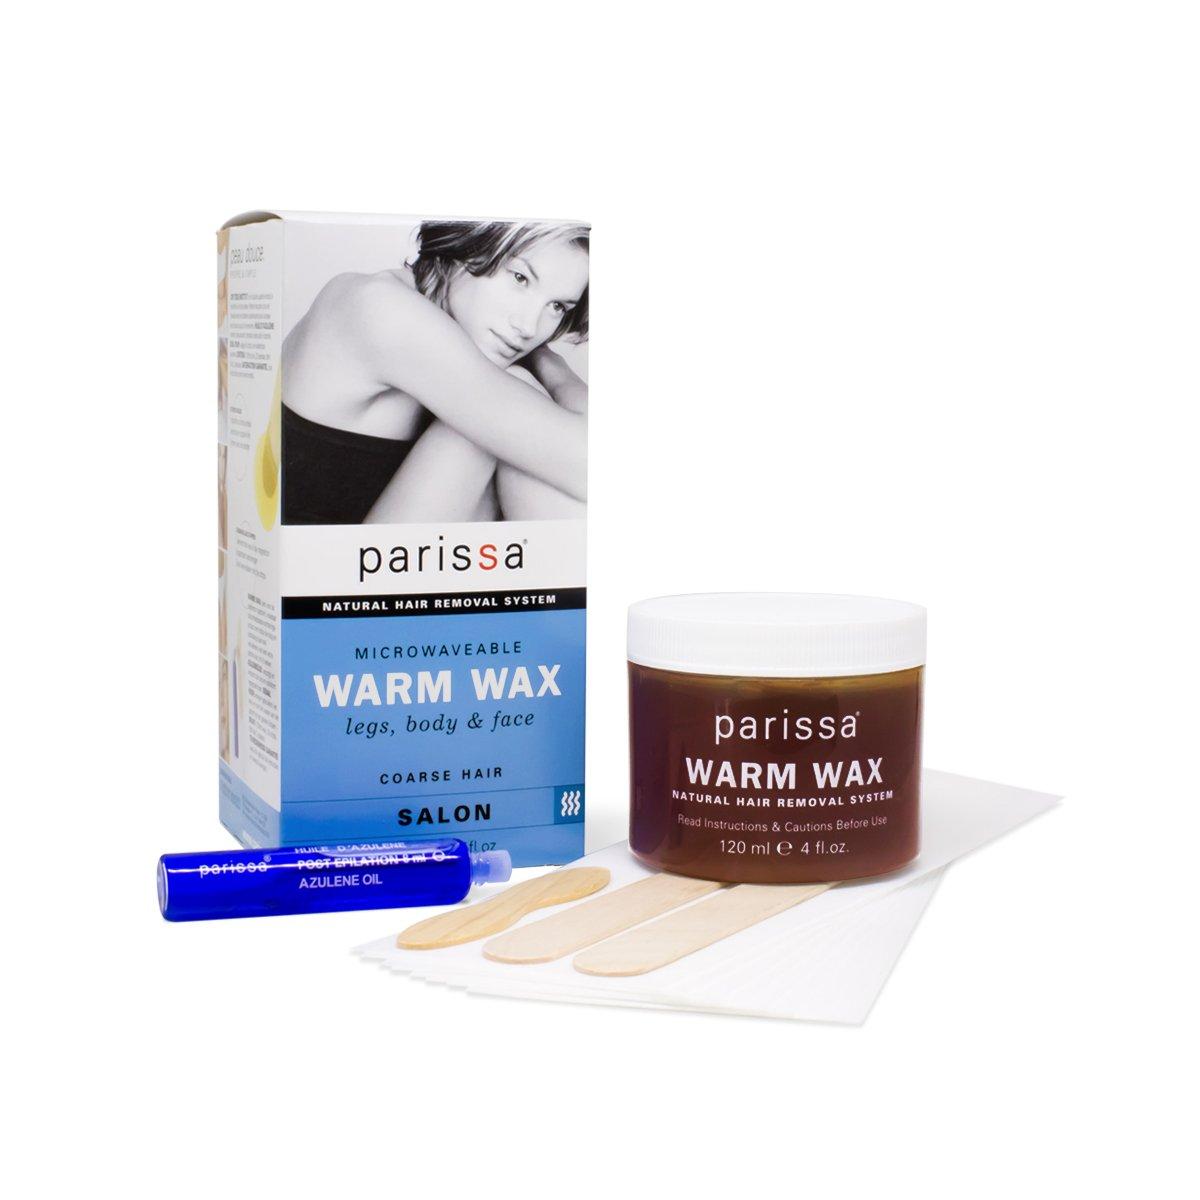 Amazon parissa hot wax bikini brazilian waxing kit with parissa warm wax hair removal waxing kit professional strength for body waxing 4 fl solutioingenieria Choice Image